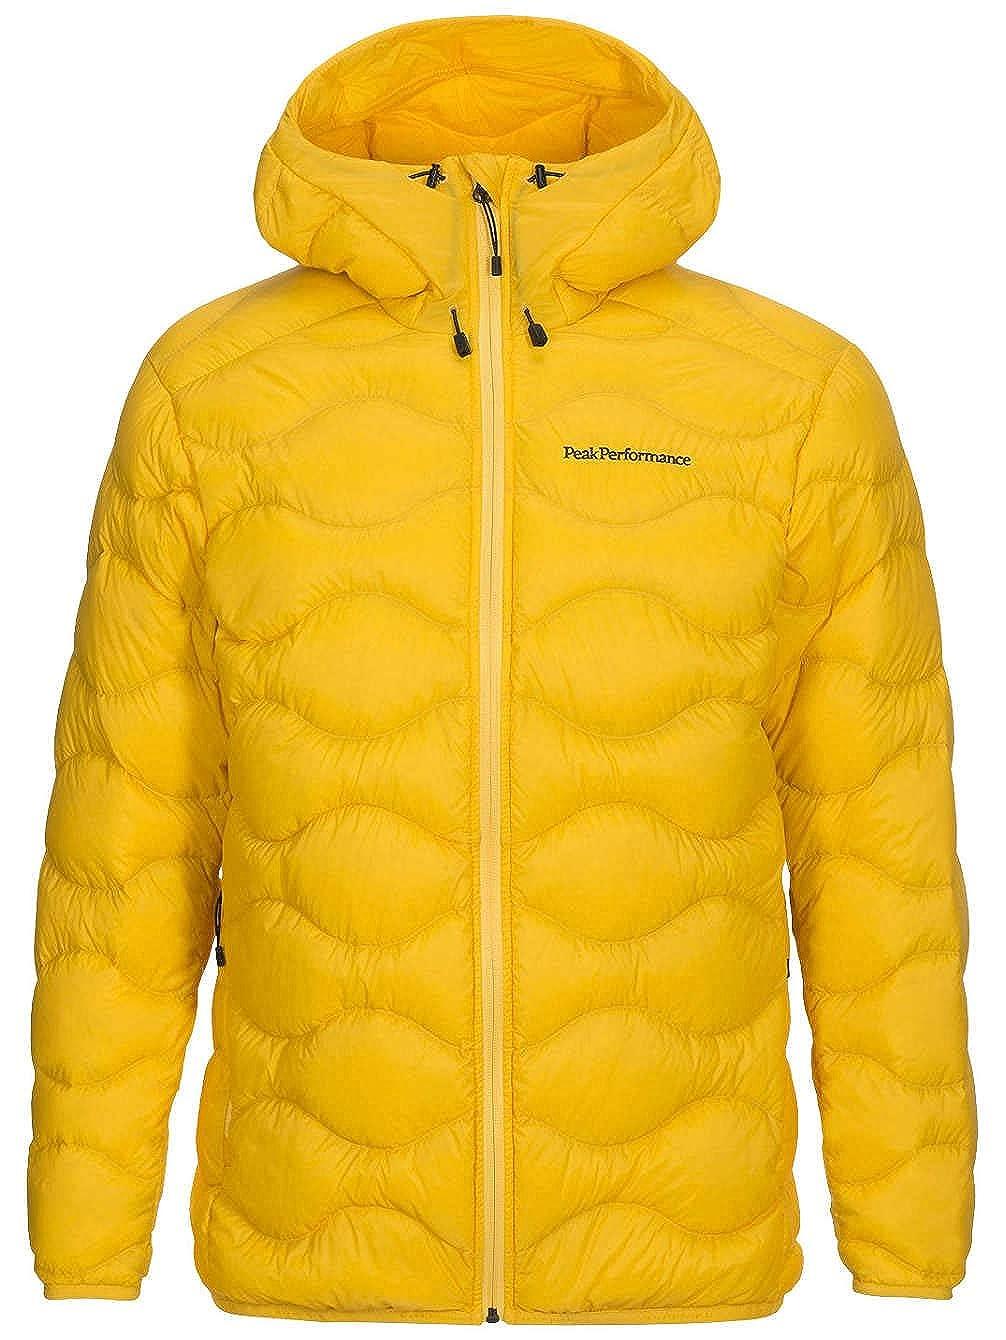 Yellow (desert Yellow) L Peak Performance Men's Helium Jacket